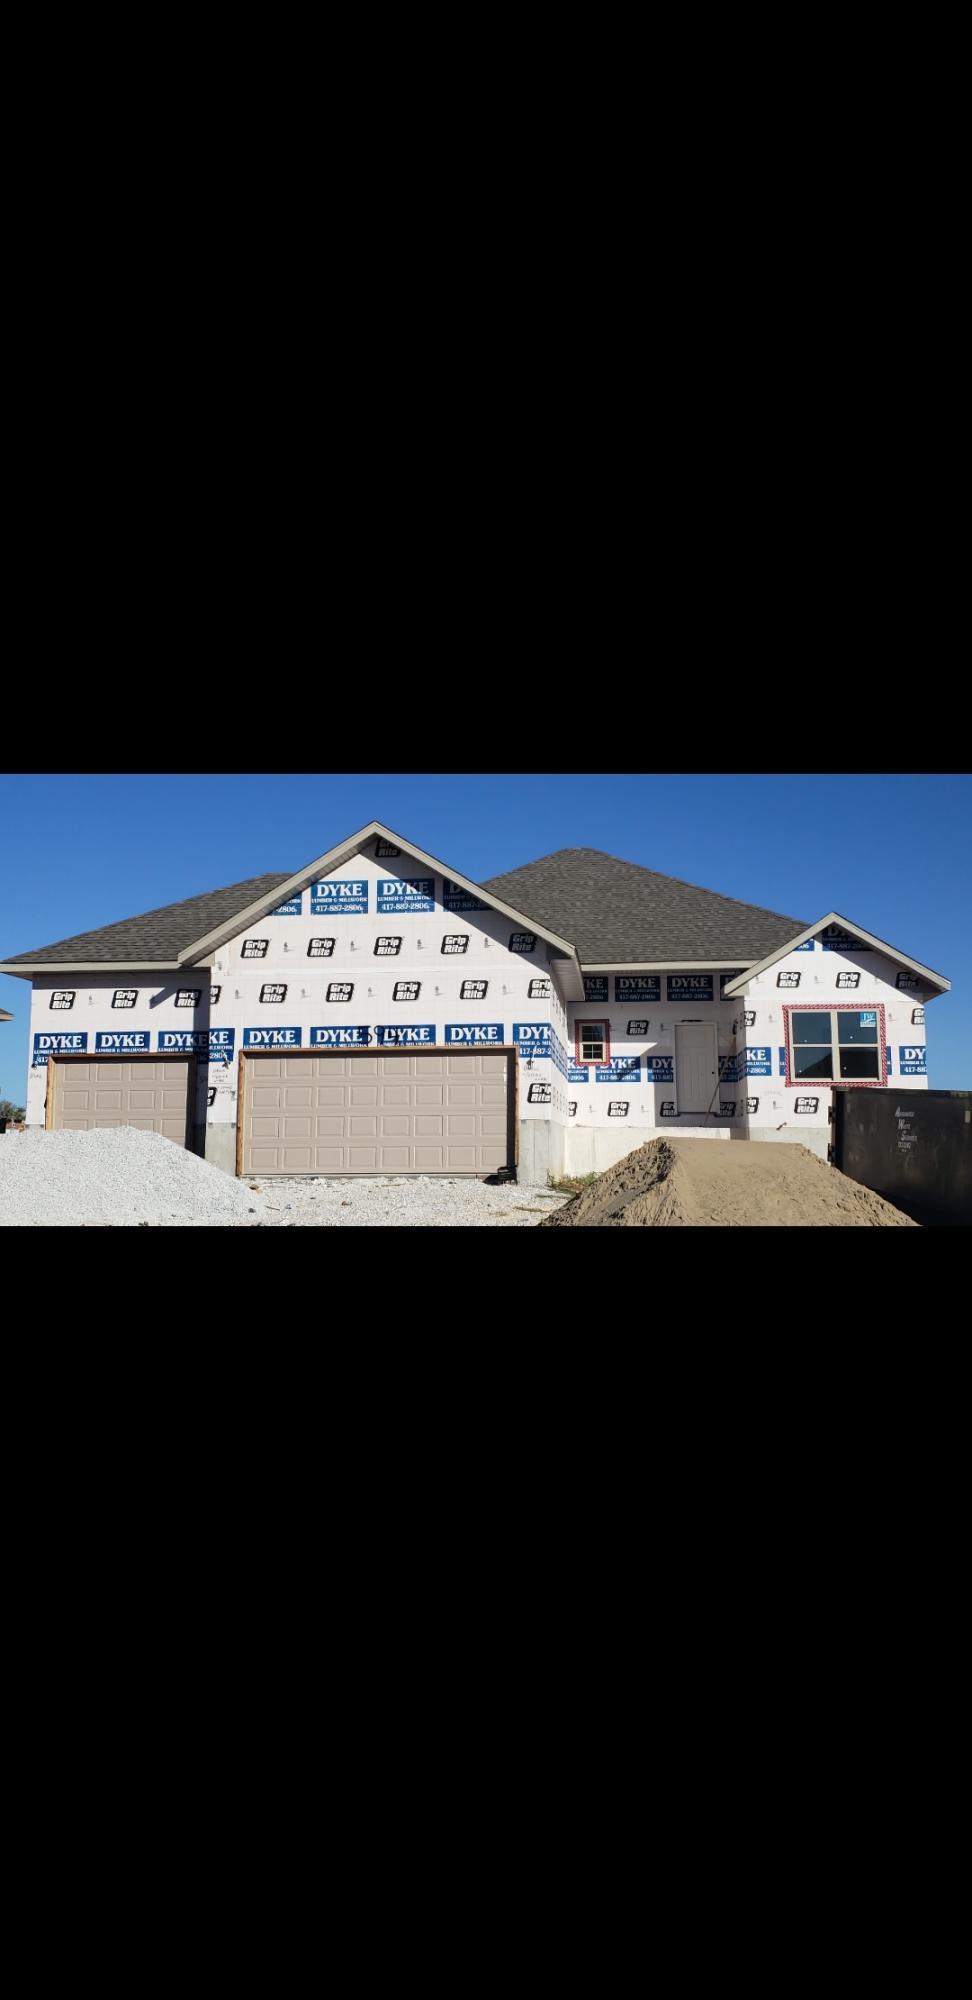 594 South Elegant Drive, Nixa, MO 65714